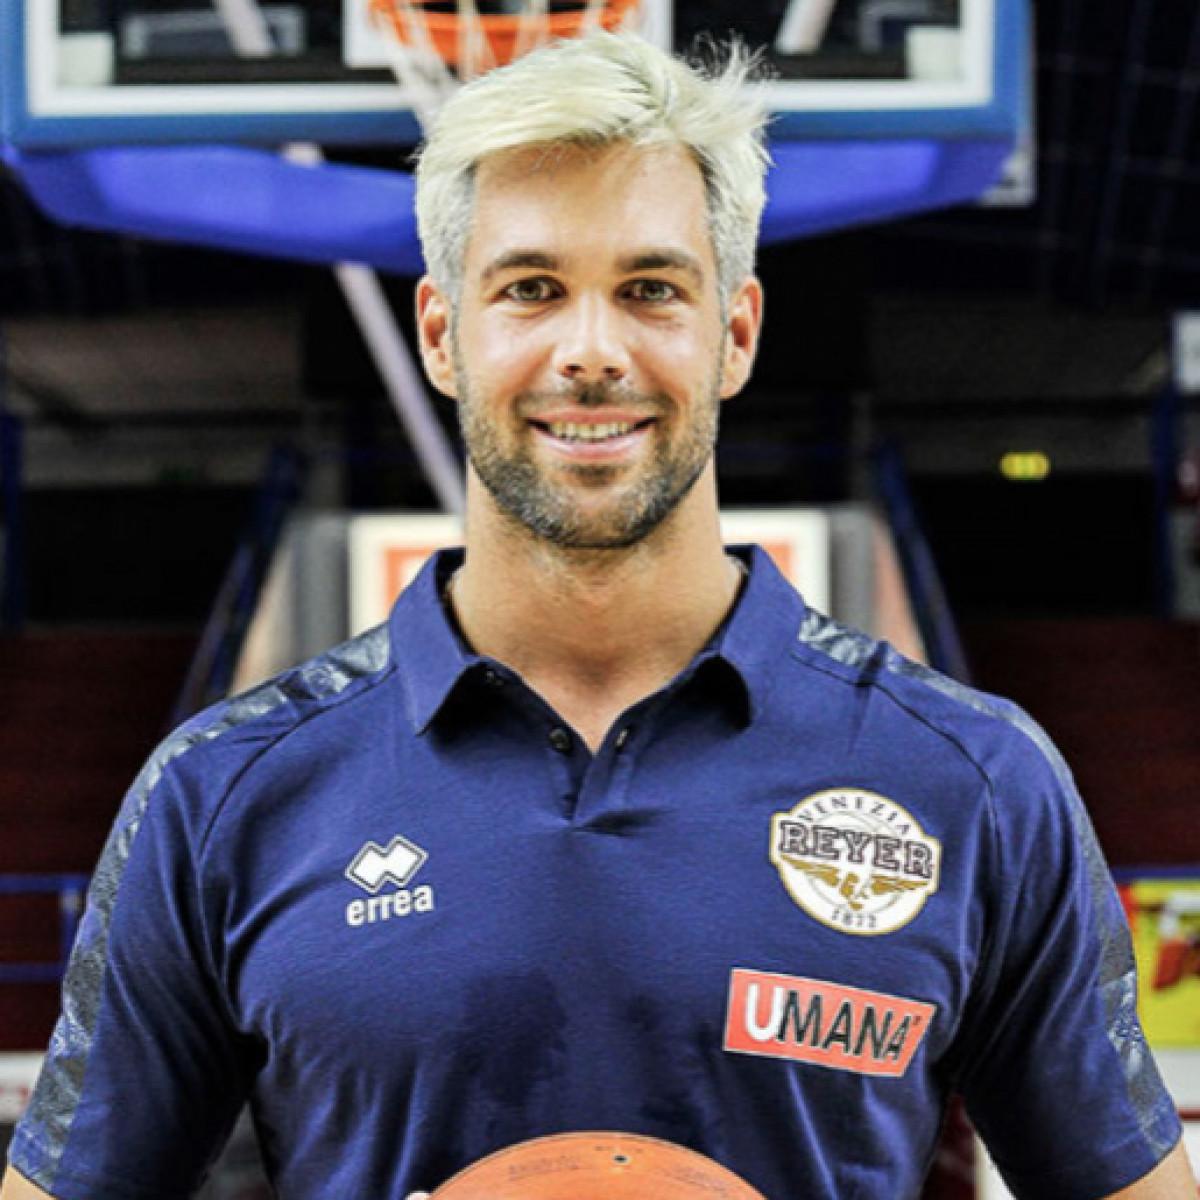 Photo of Bruno Cerella, 2018-2019 season